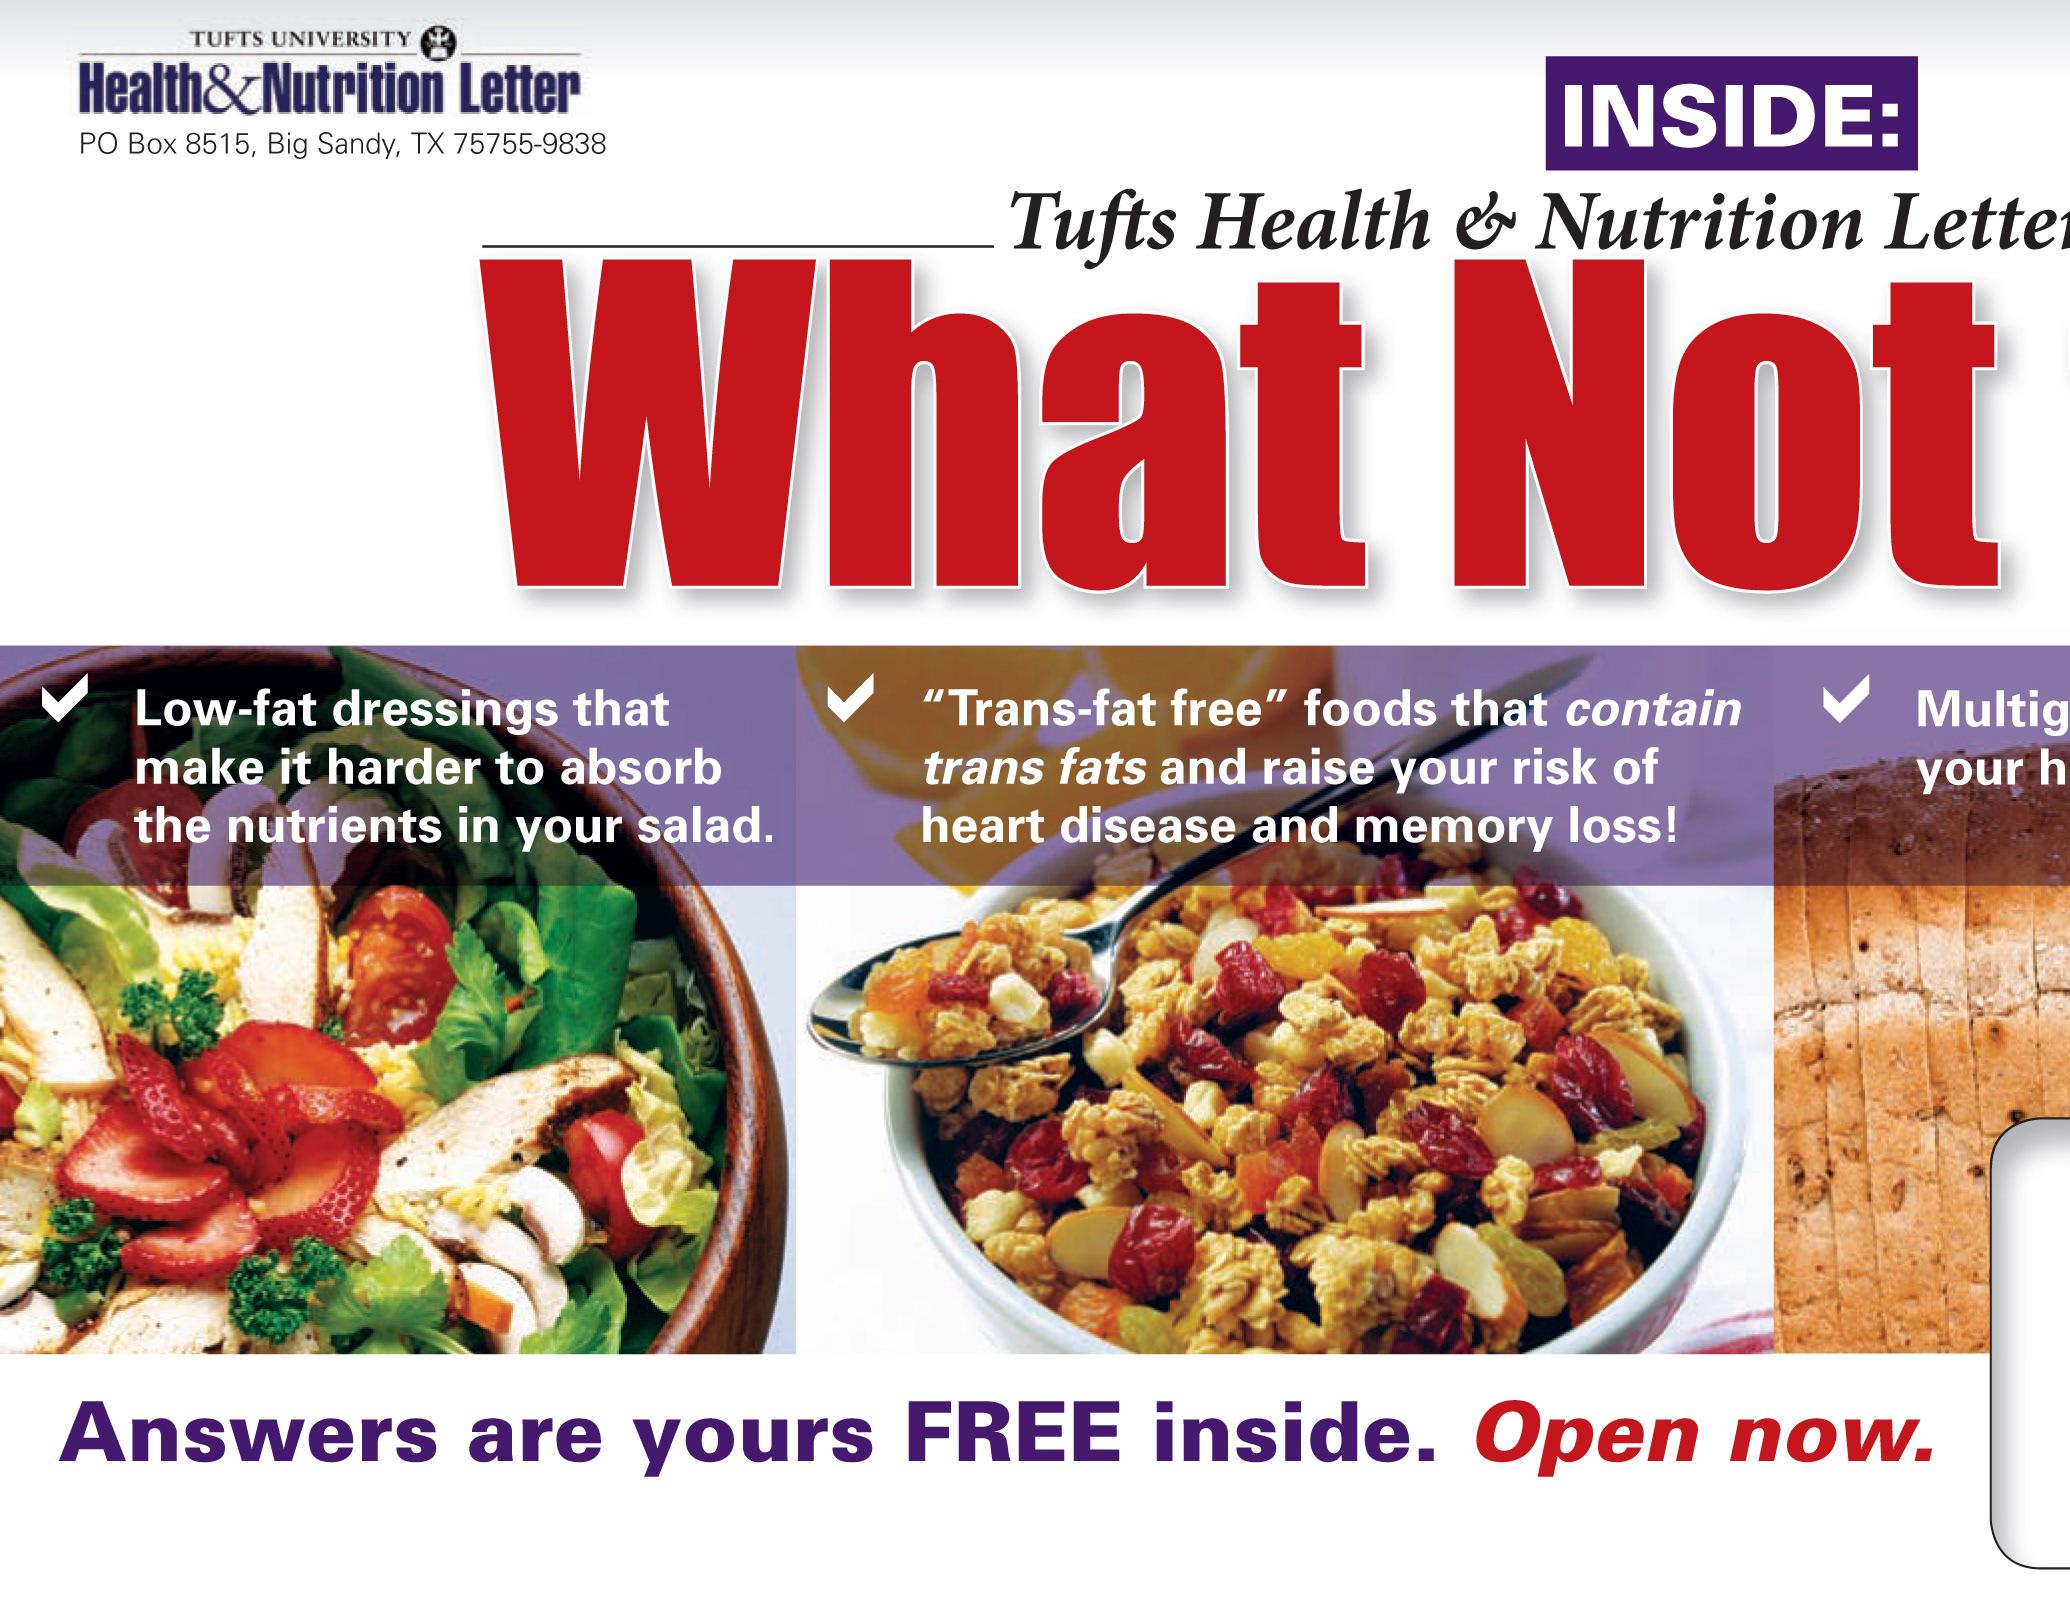 Ericka Dreisbach - Tufts Health & Nutrition